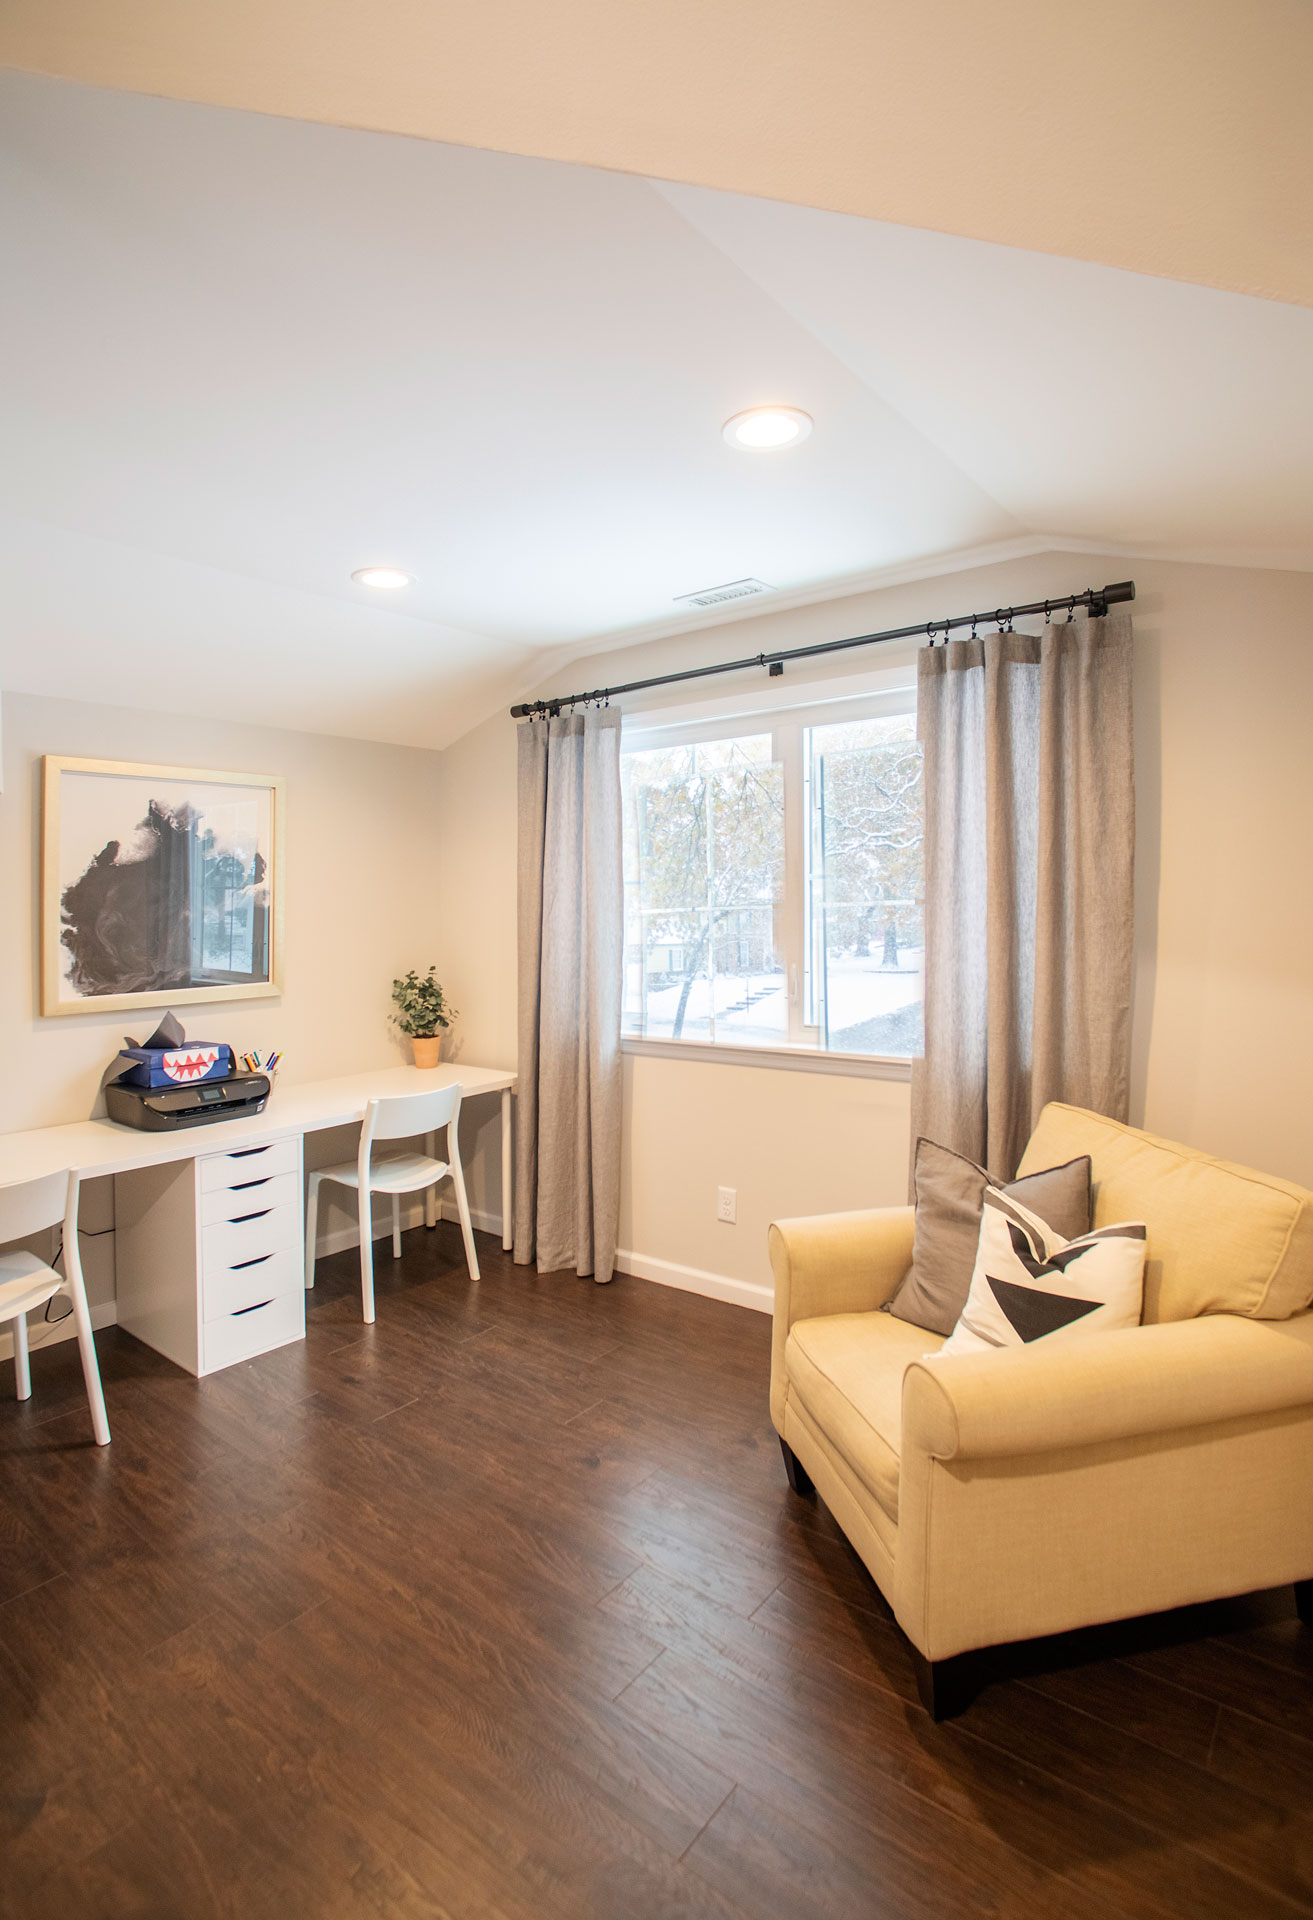 Roeser-Home-Remodeling-St-Louis-Longview-dormer-1